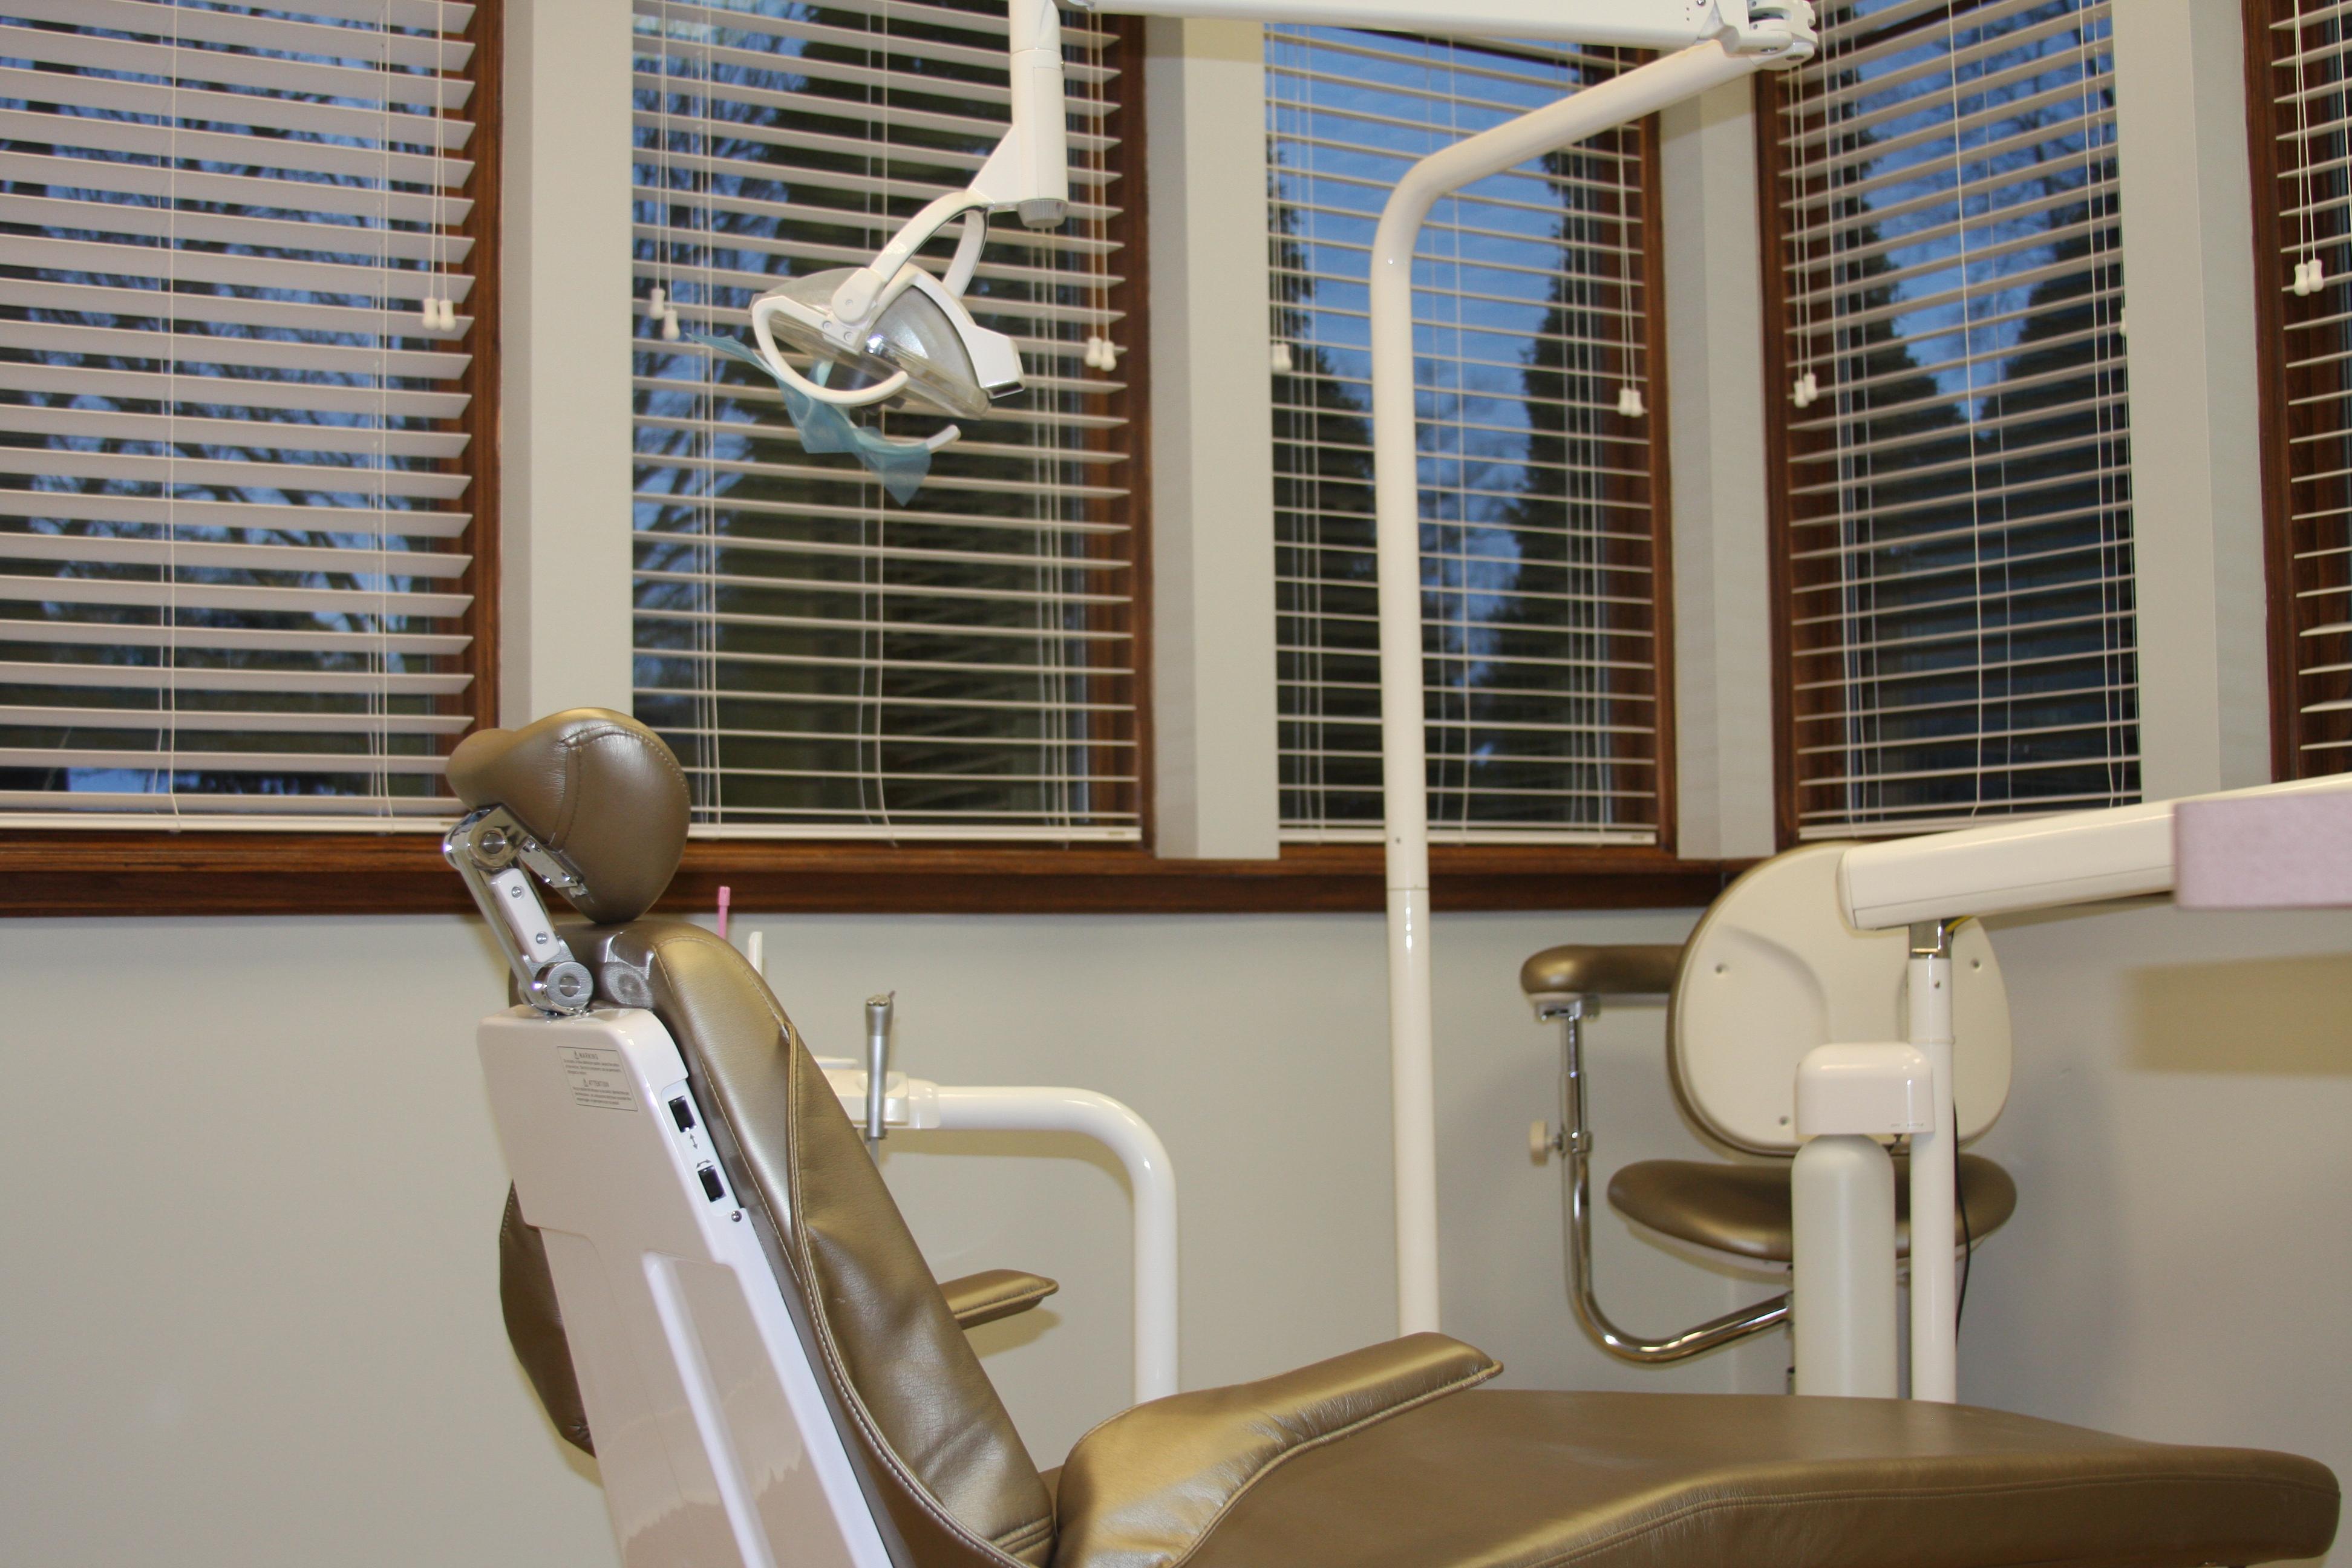 Tru Family Dental Crystal Lake - Dr. John W Yang DMD